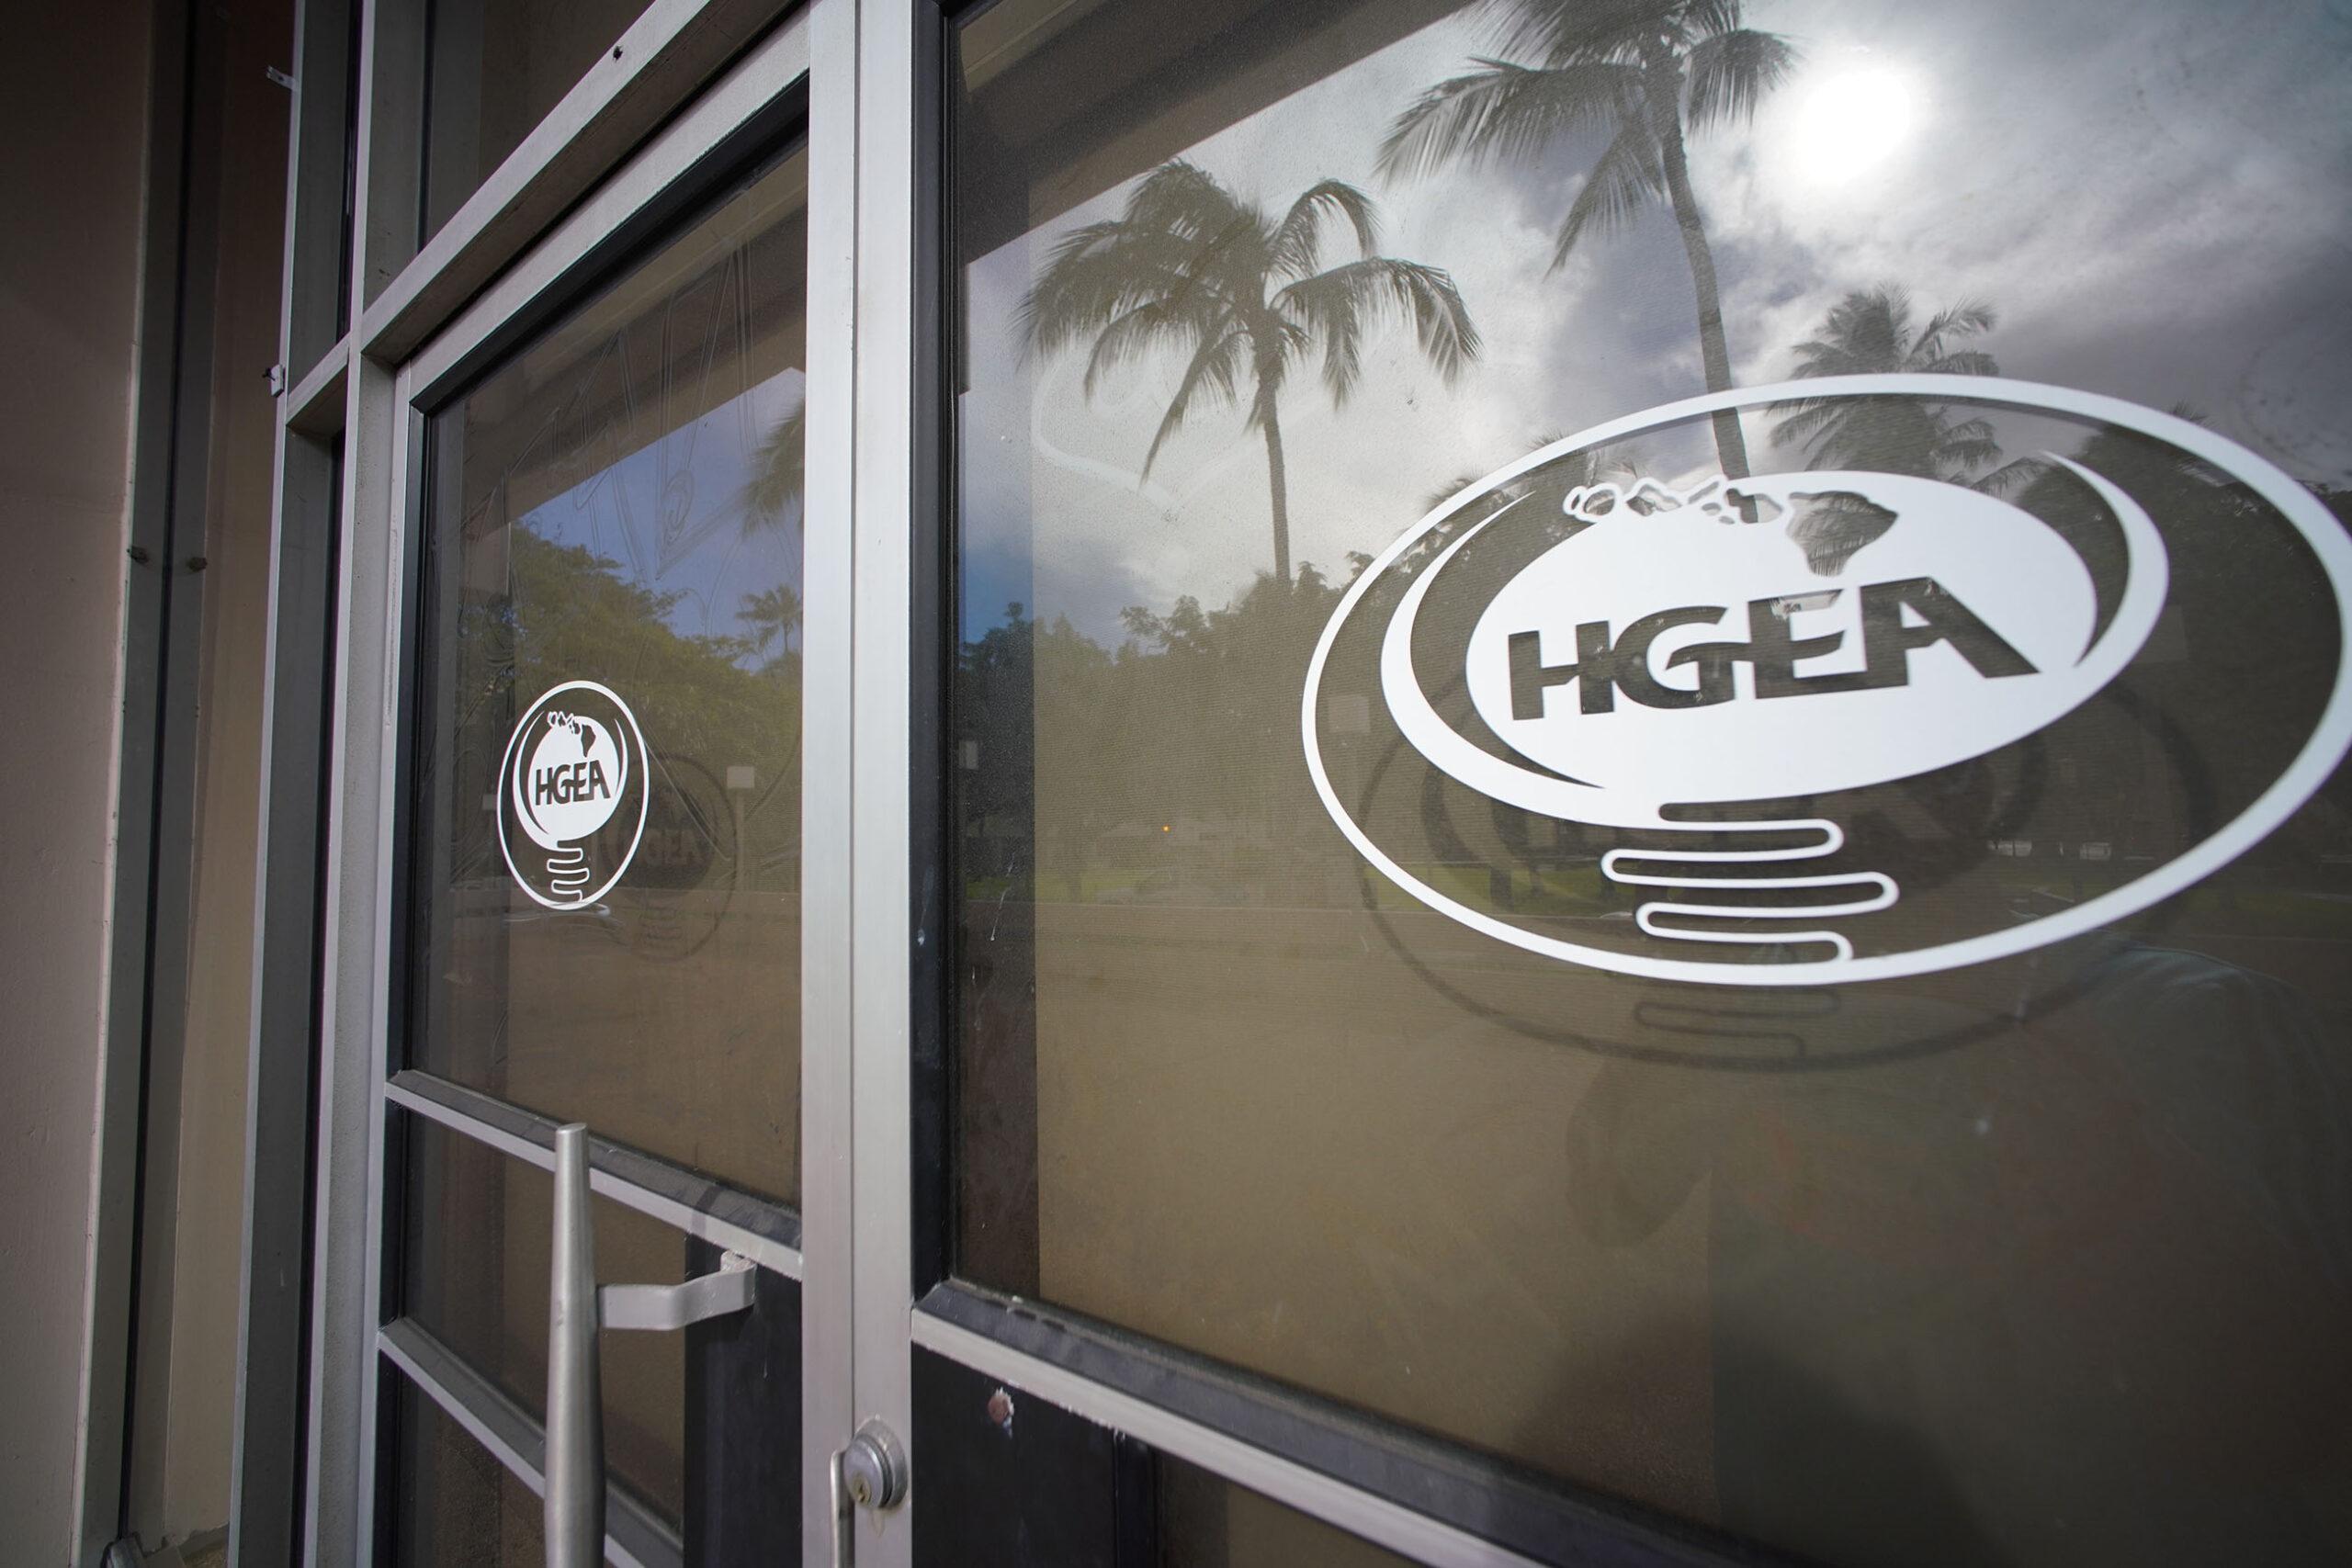 HGEA Headquarters located at 888 Mililani Street.